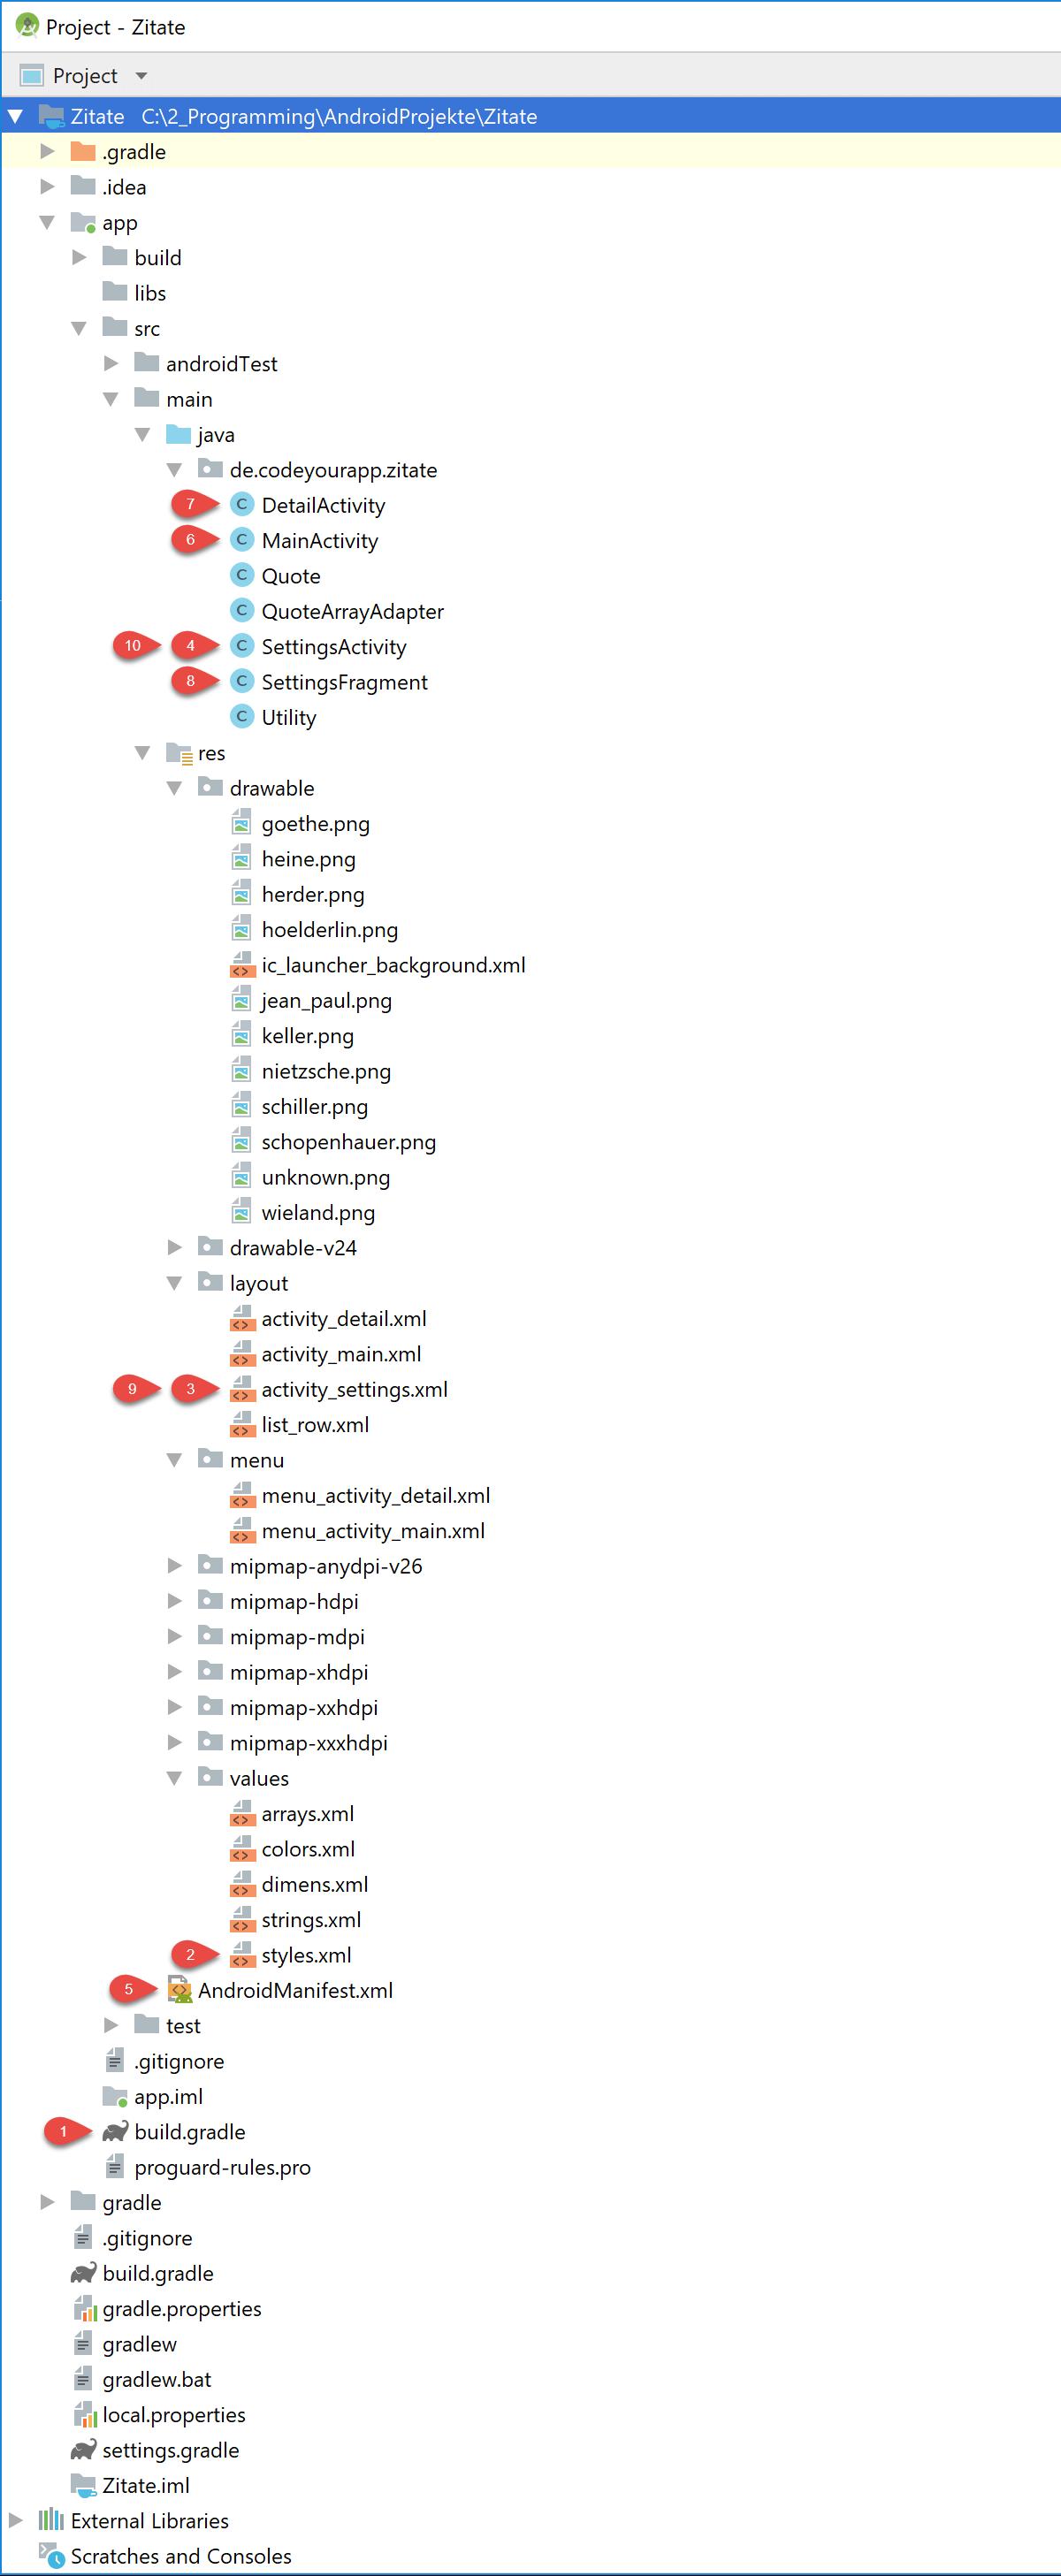 projekt_struktur_10-1iii